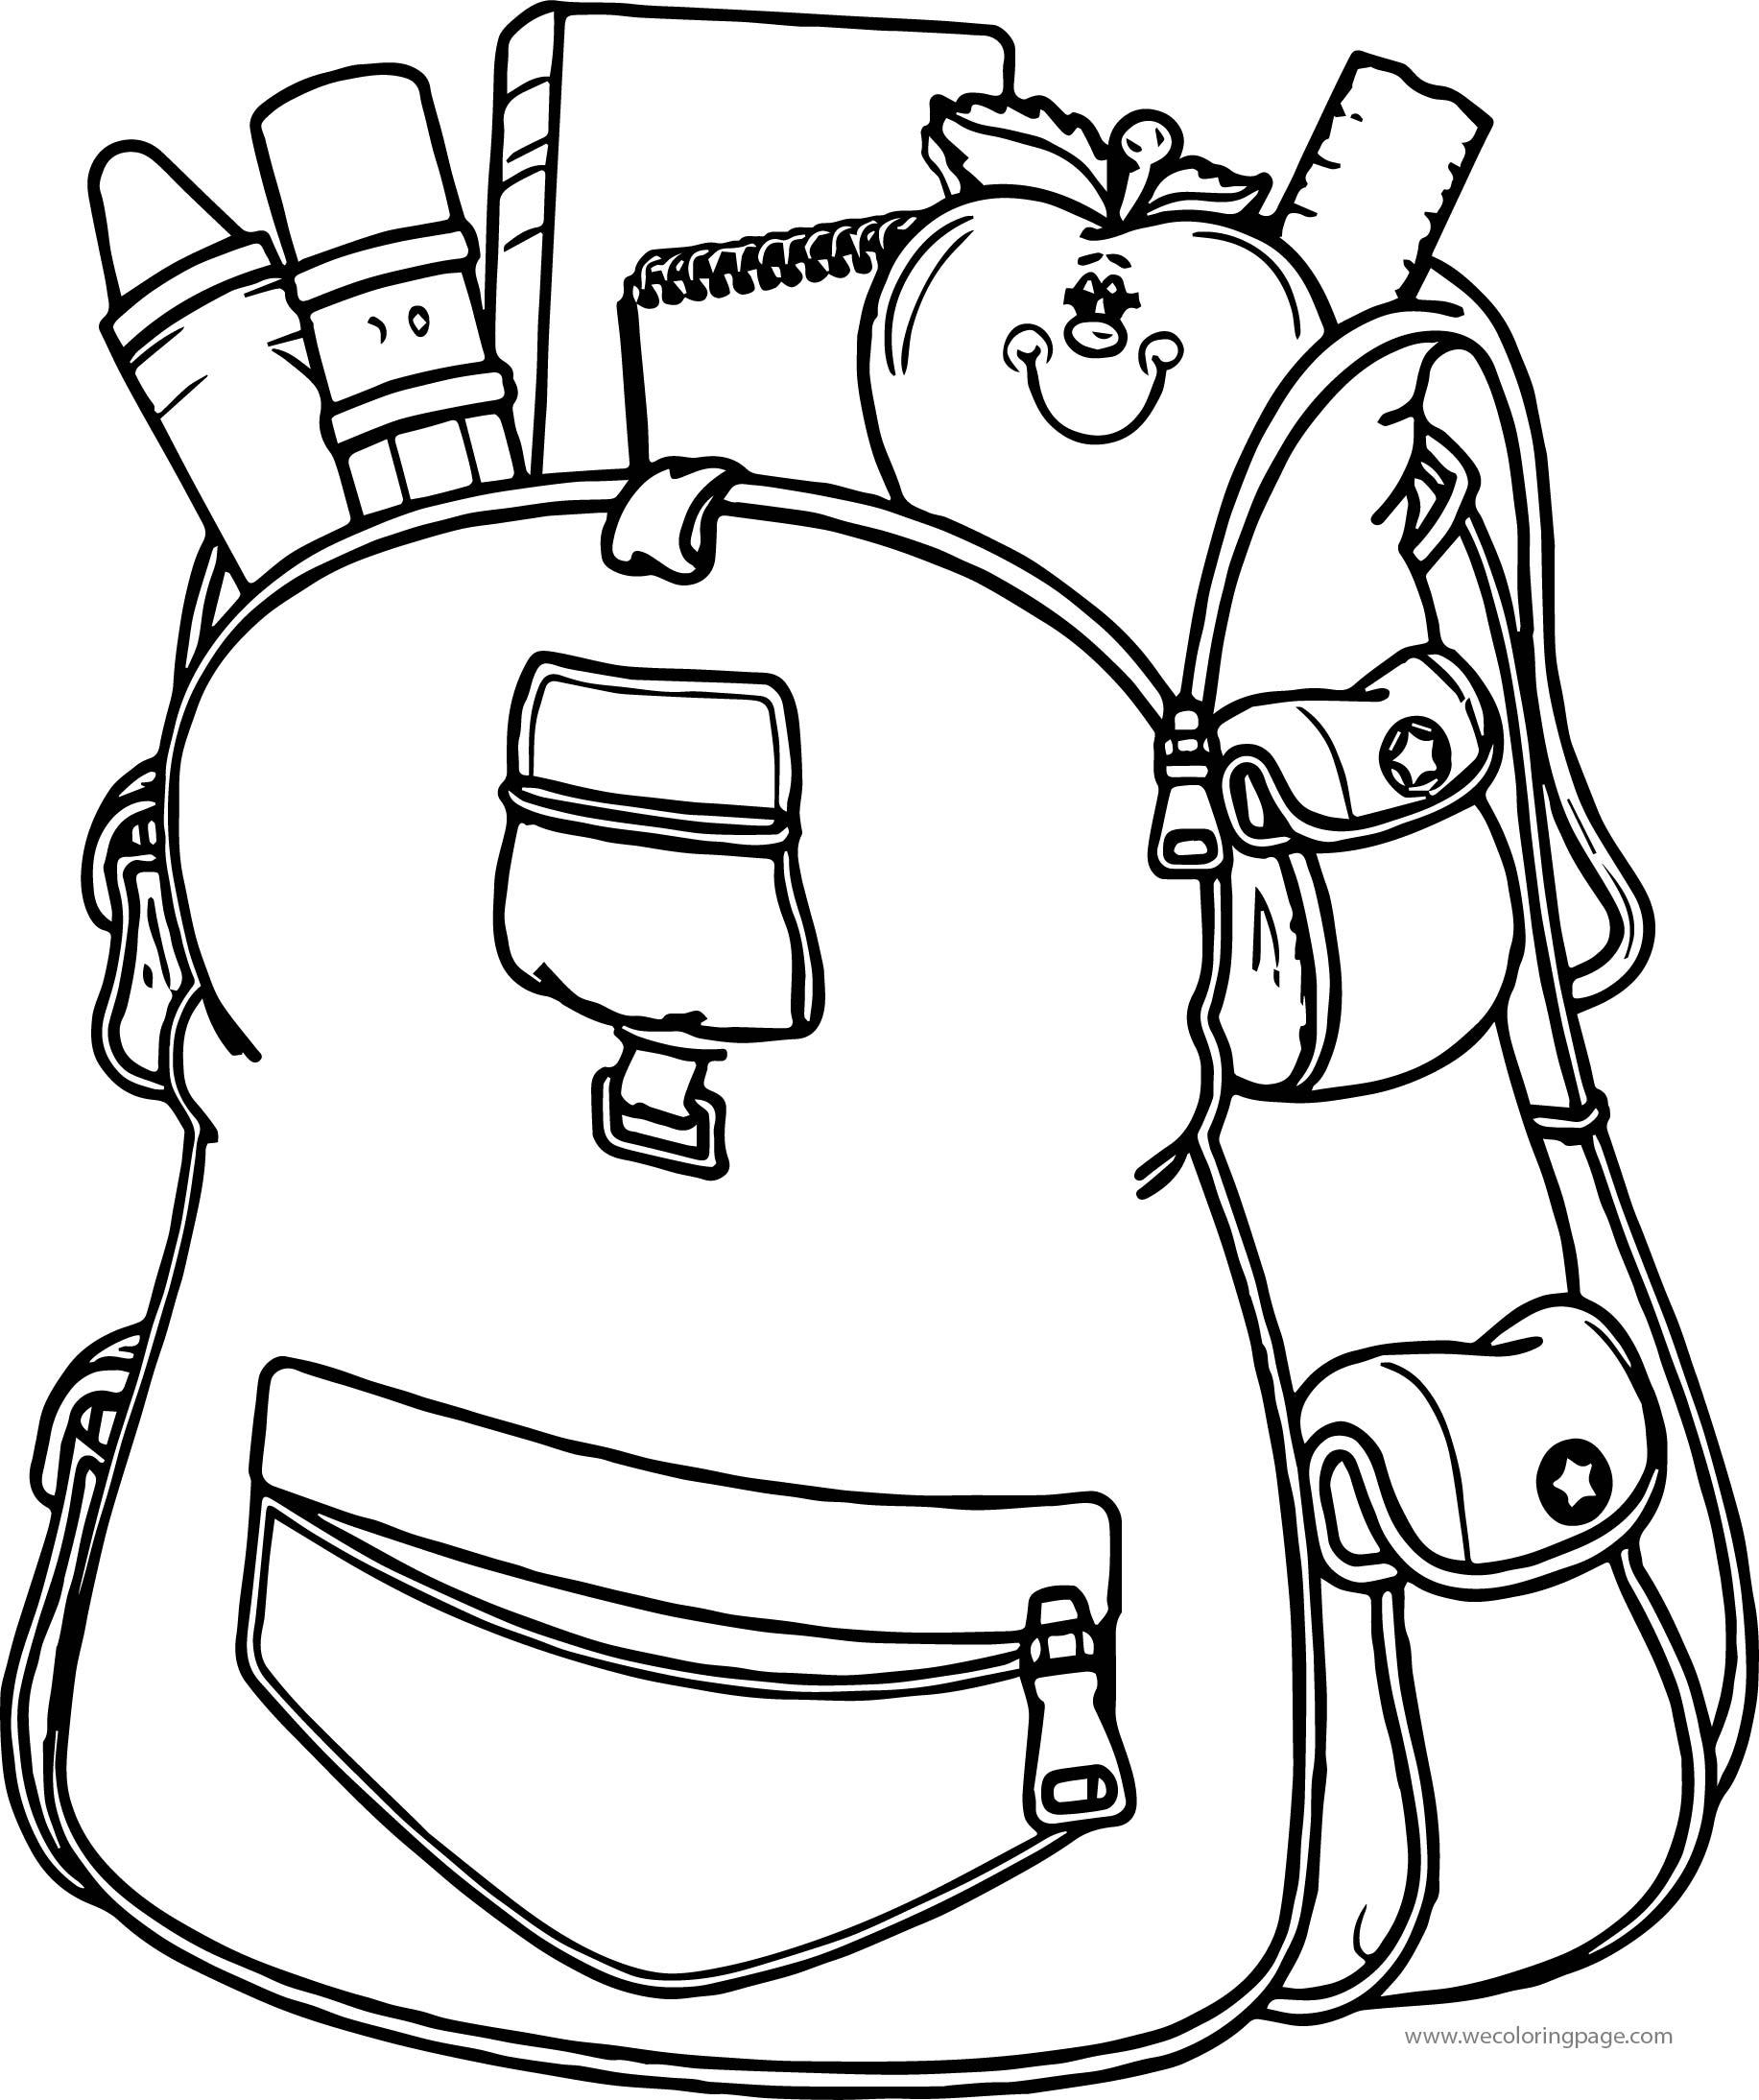 I School Bag Coloring Page